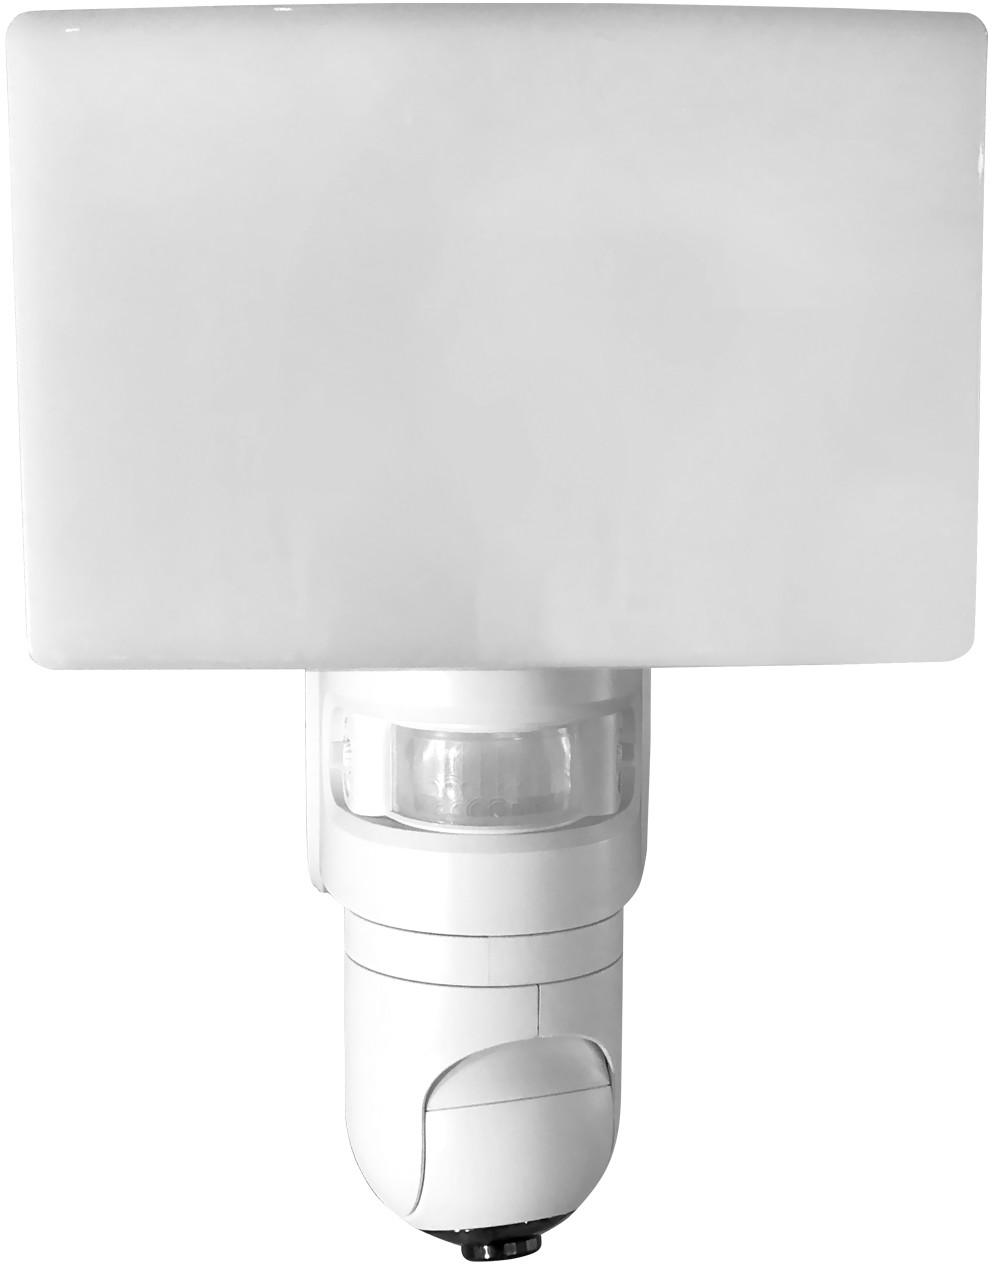 Kobi Naświetlacz LED KAMI 10W barwa NEUTRALNA czujnik ruchu + kamera) KFKI10NB